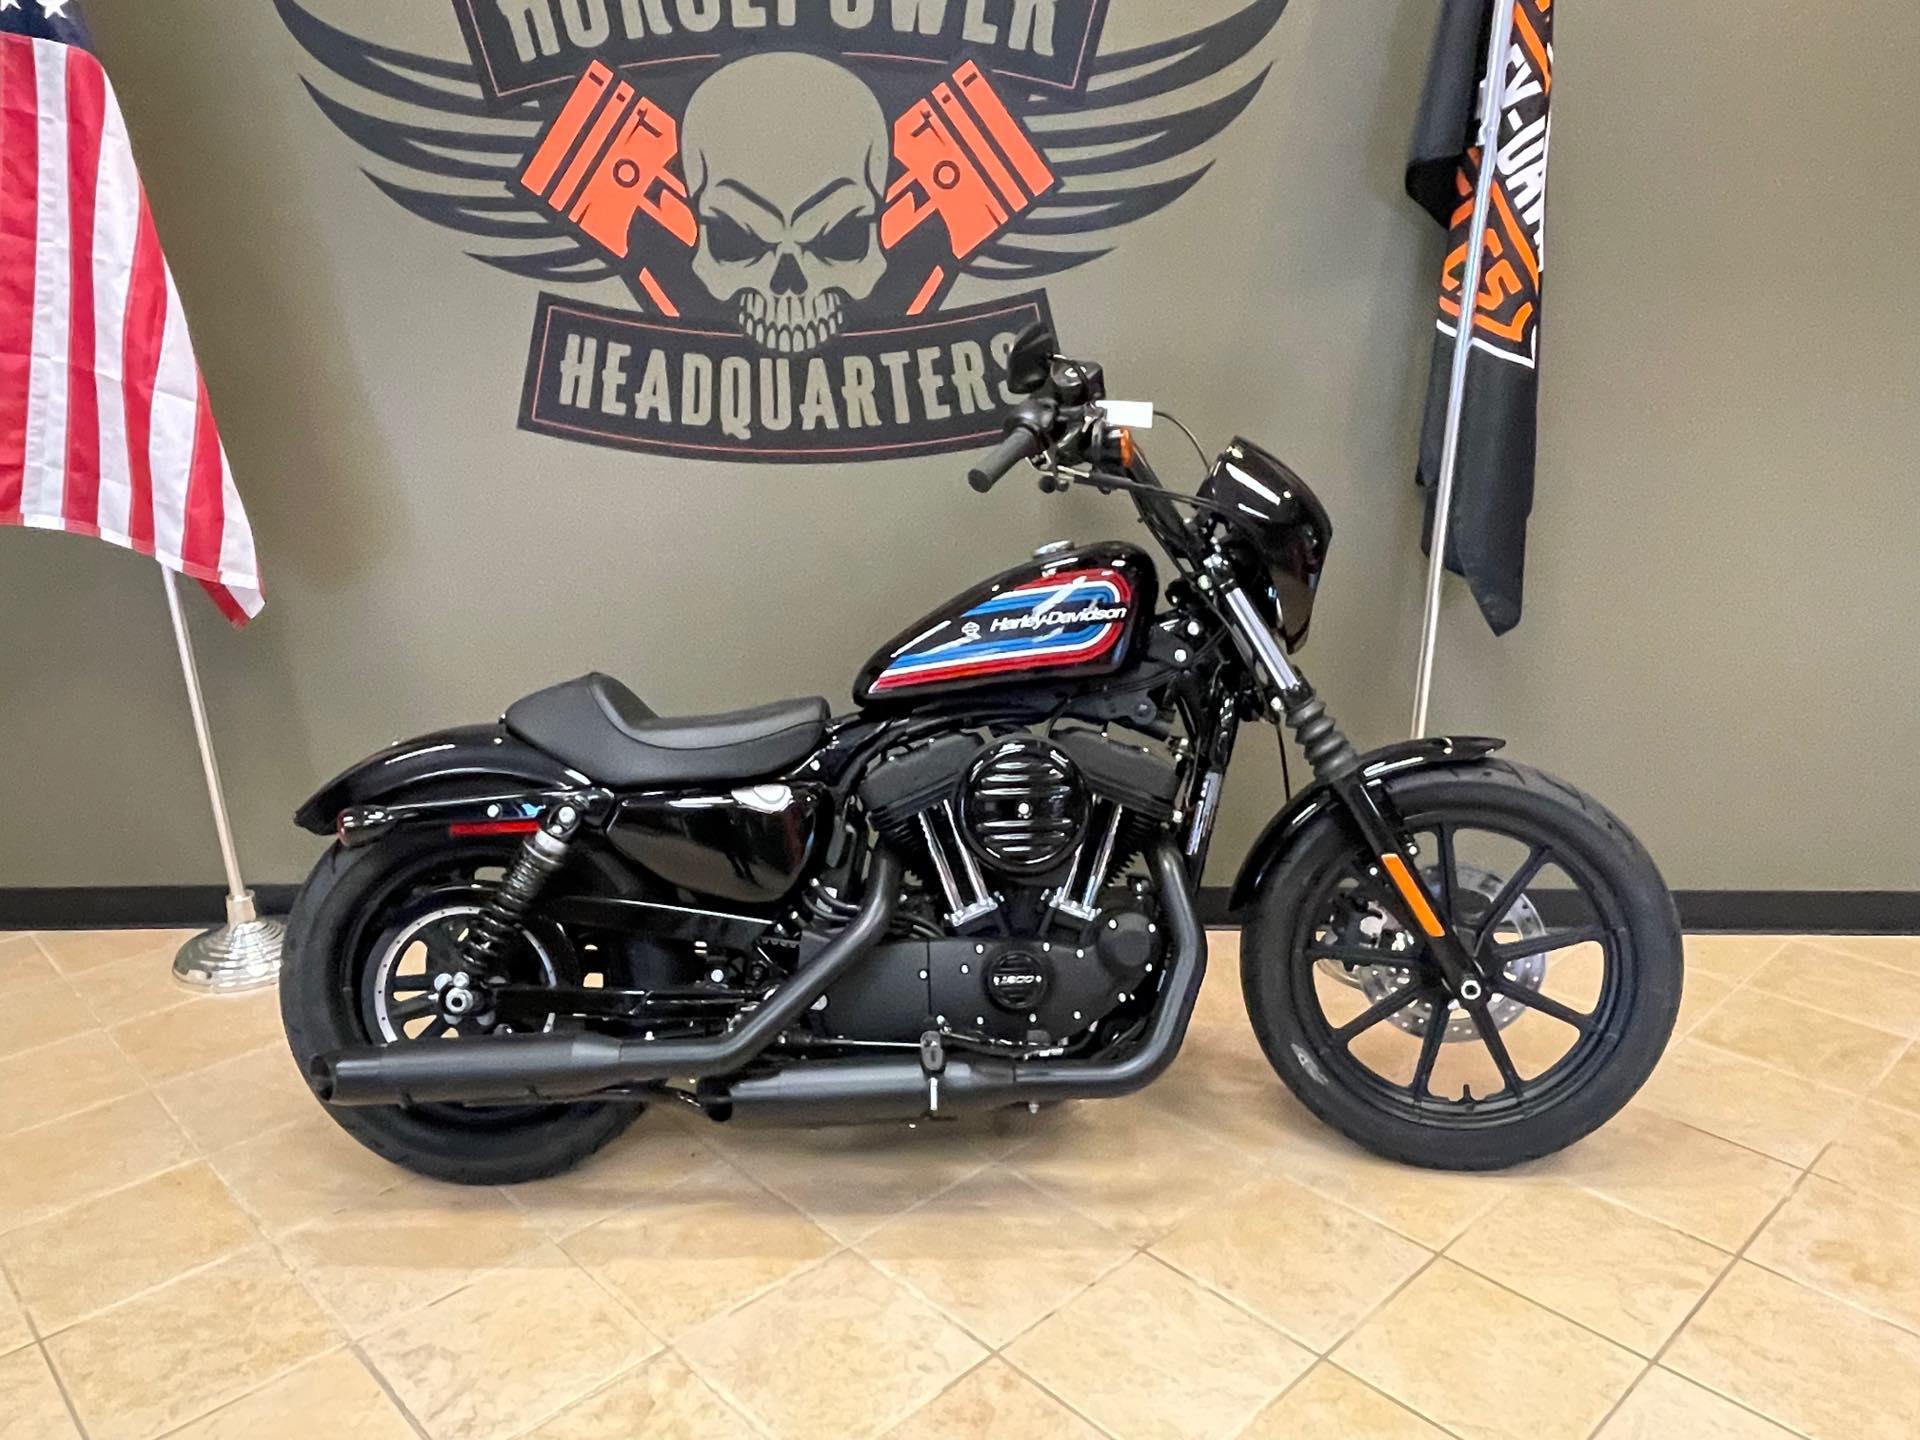 2021 Harley-Davidson Cruiser XL 1200NS Iron 1200 at Loess Hills Harley-Davidson